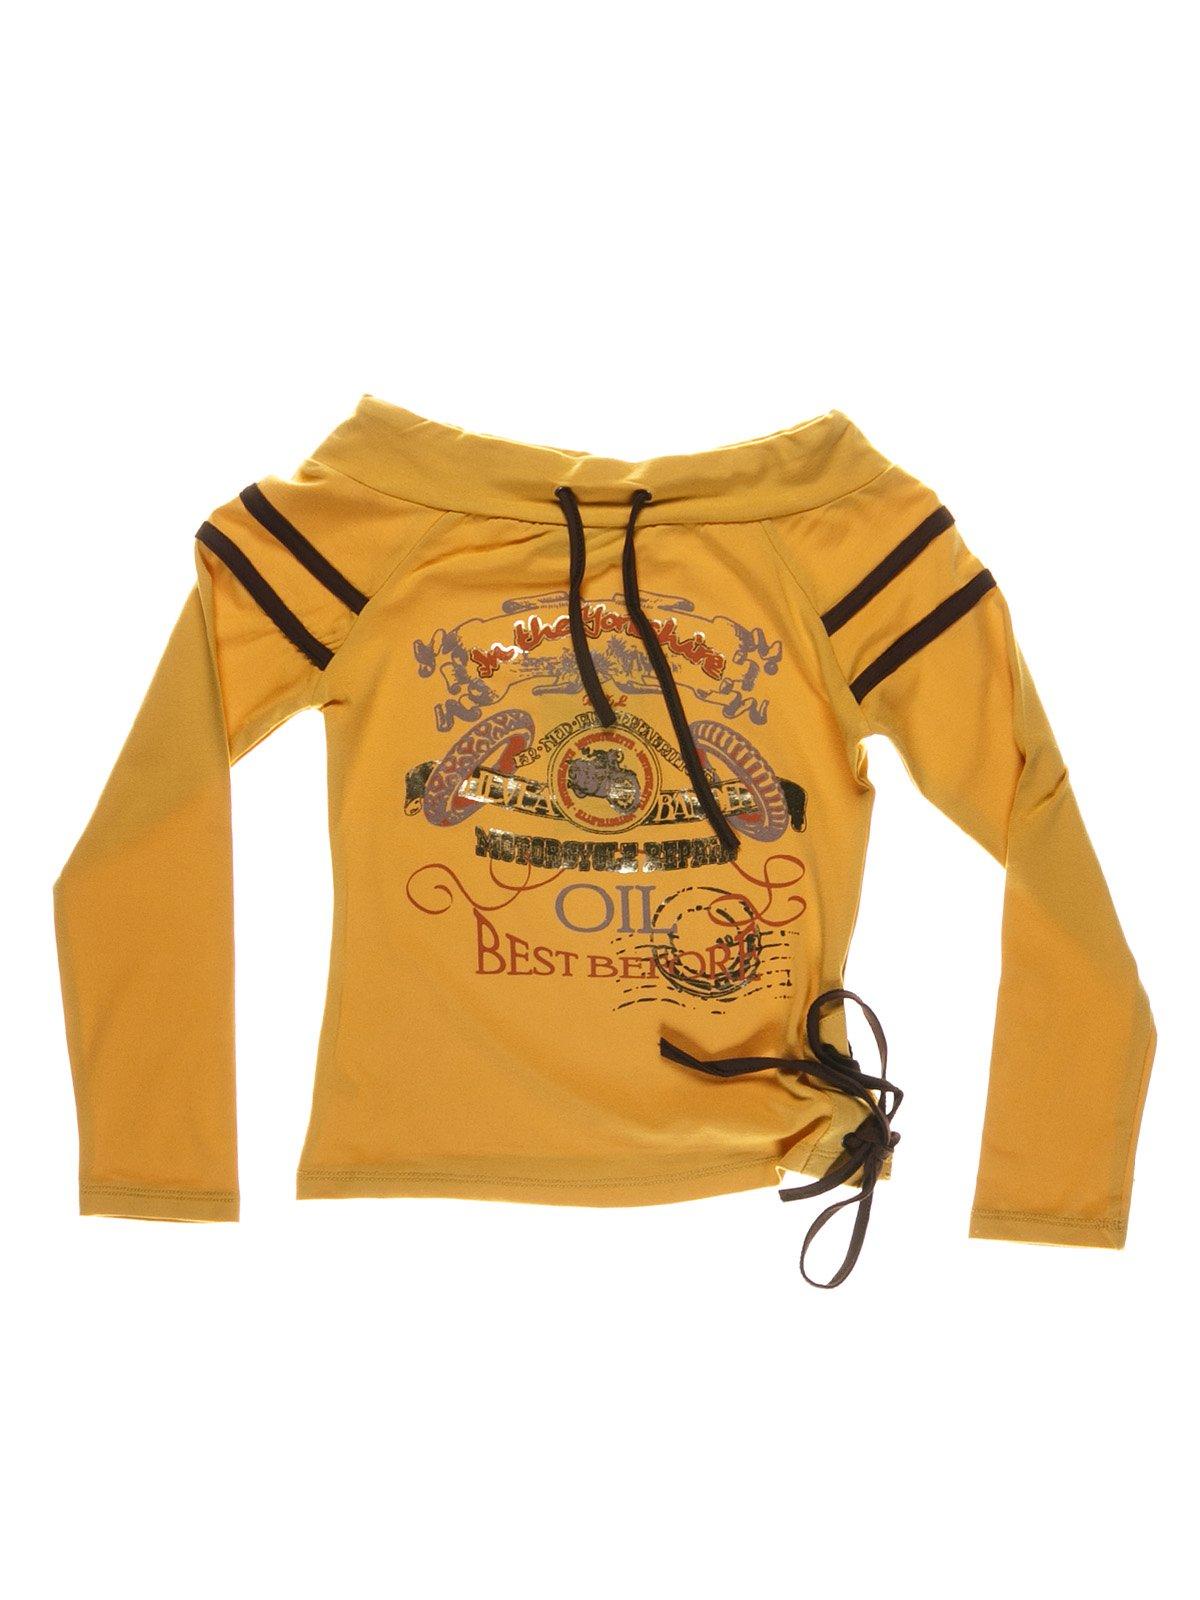 Джемпер желтый с принтом | 1547600